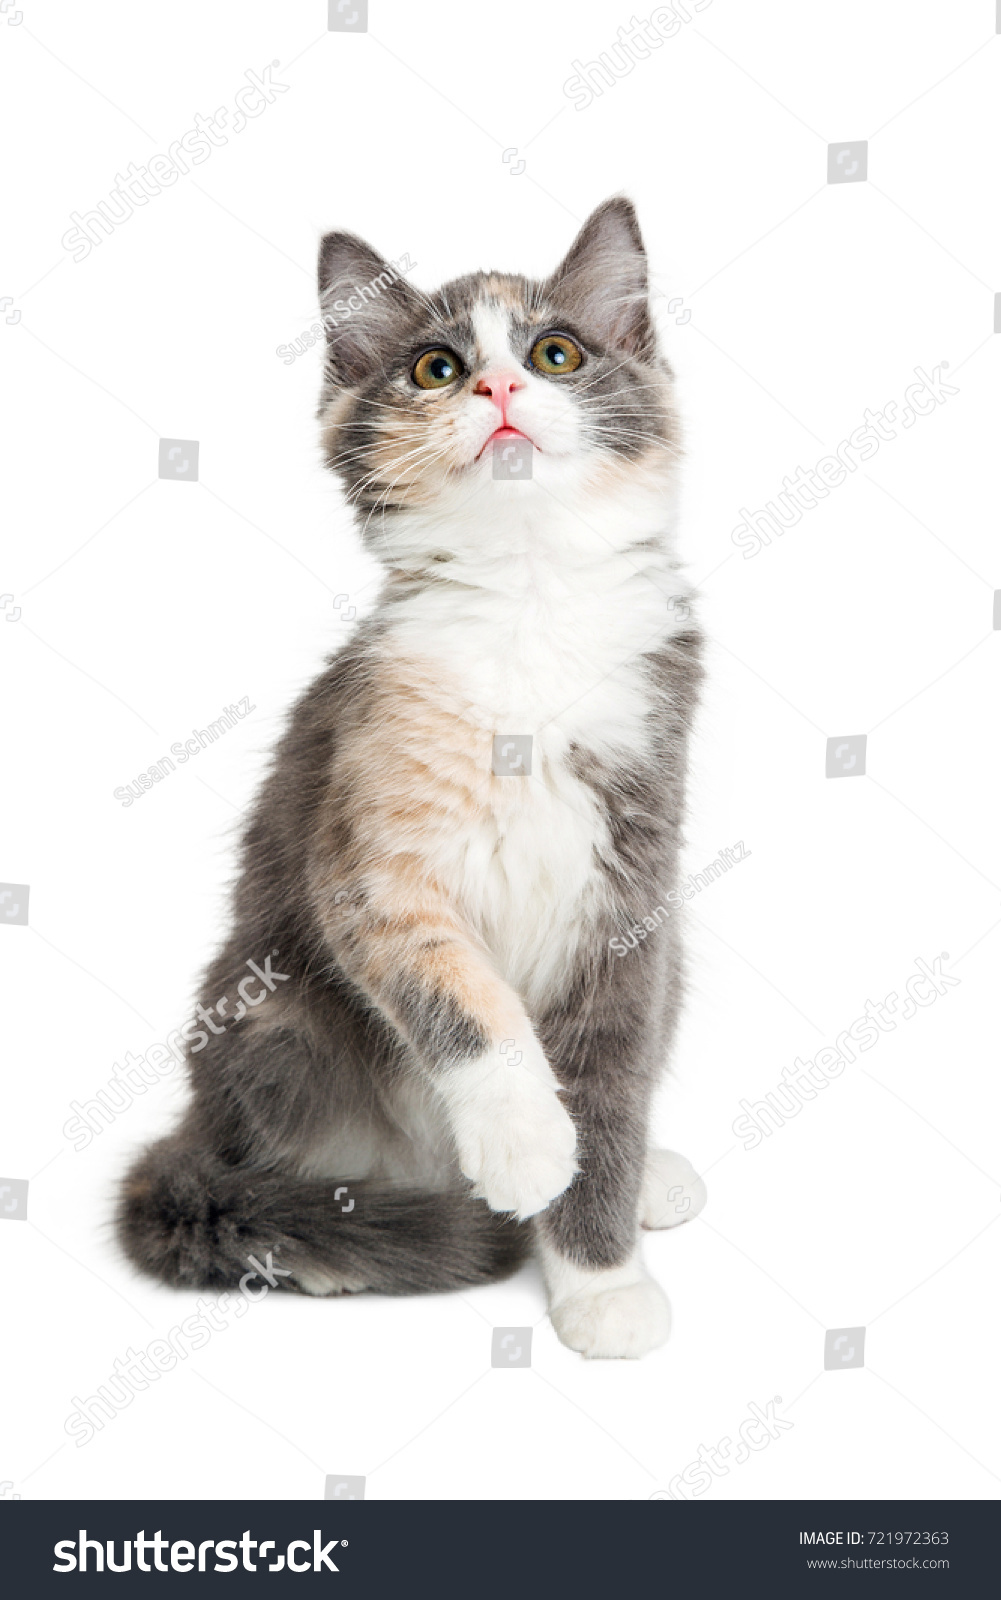 Cute Little Playful Kitten Calico Longhaired Stock